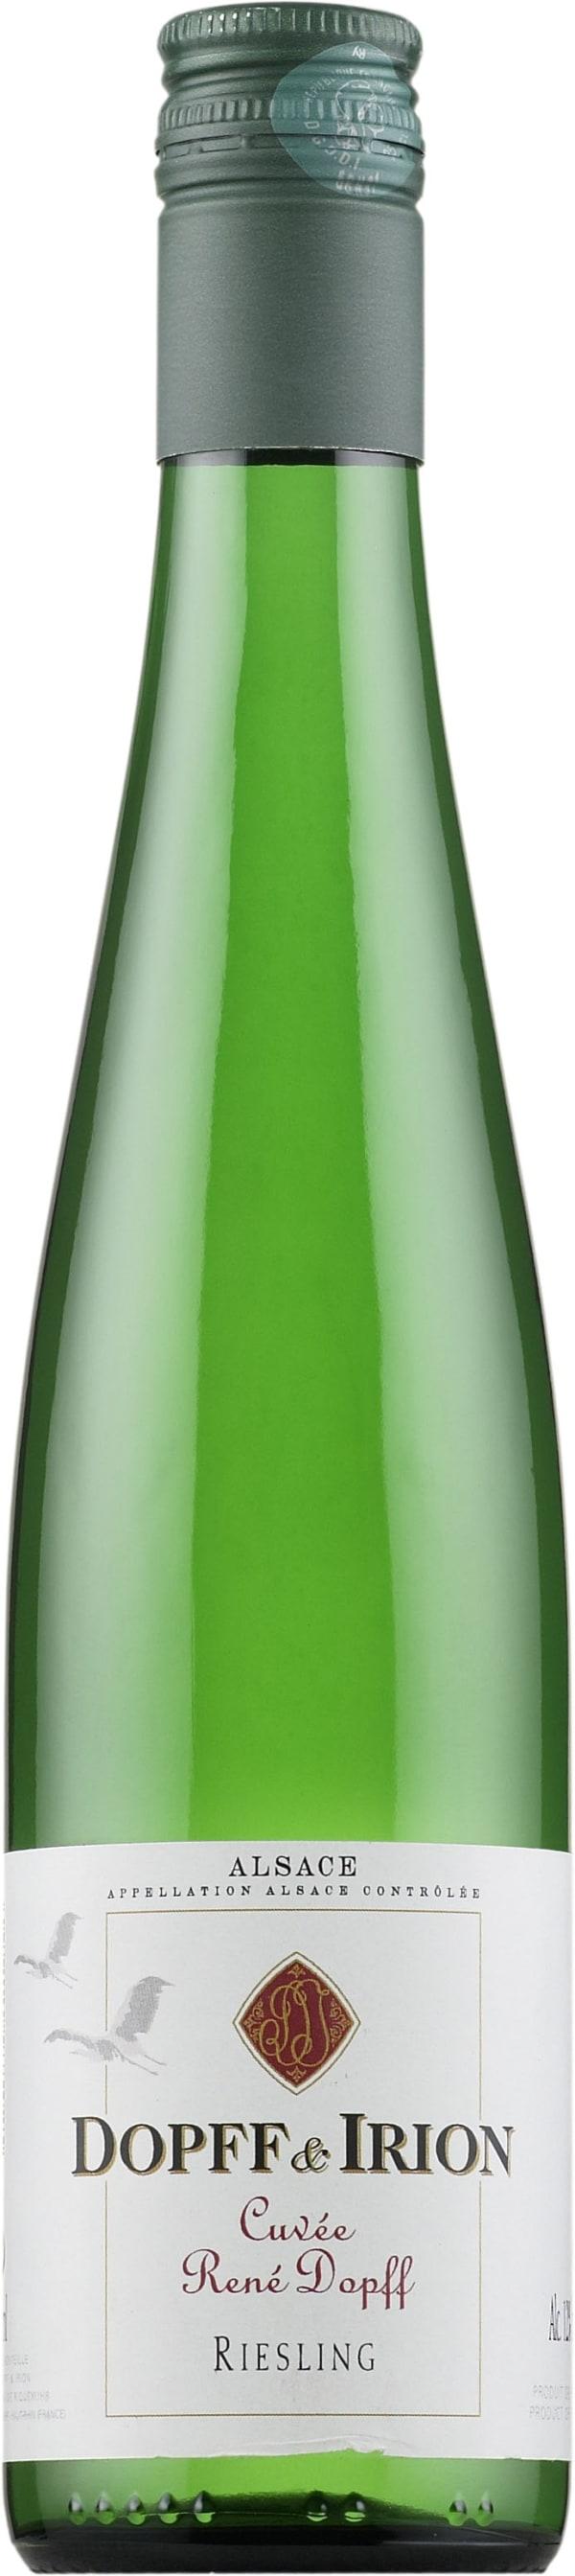 Dopff & Irion Cuvée René Dopff Riesling 2013